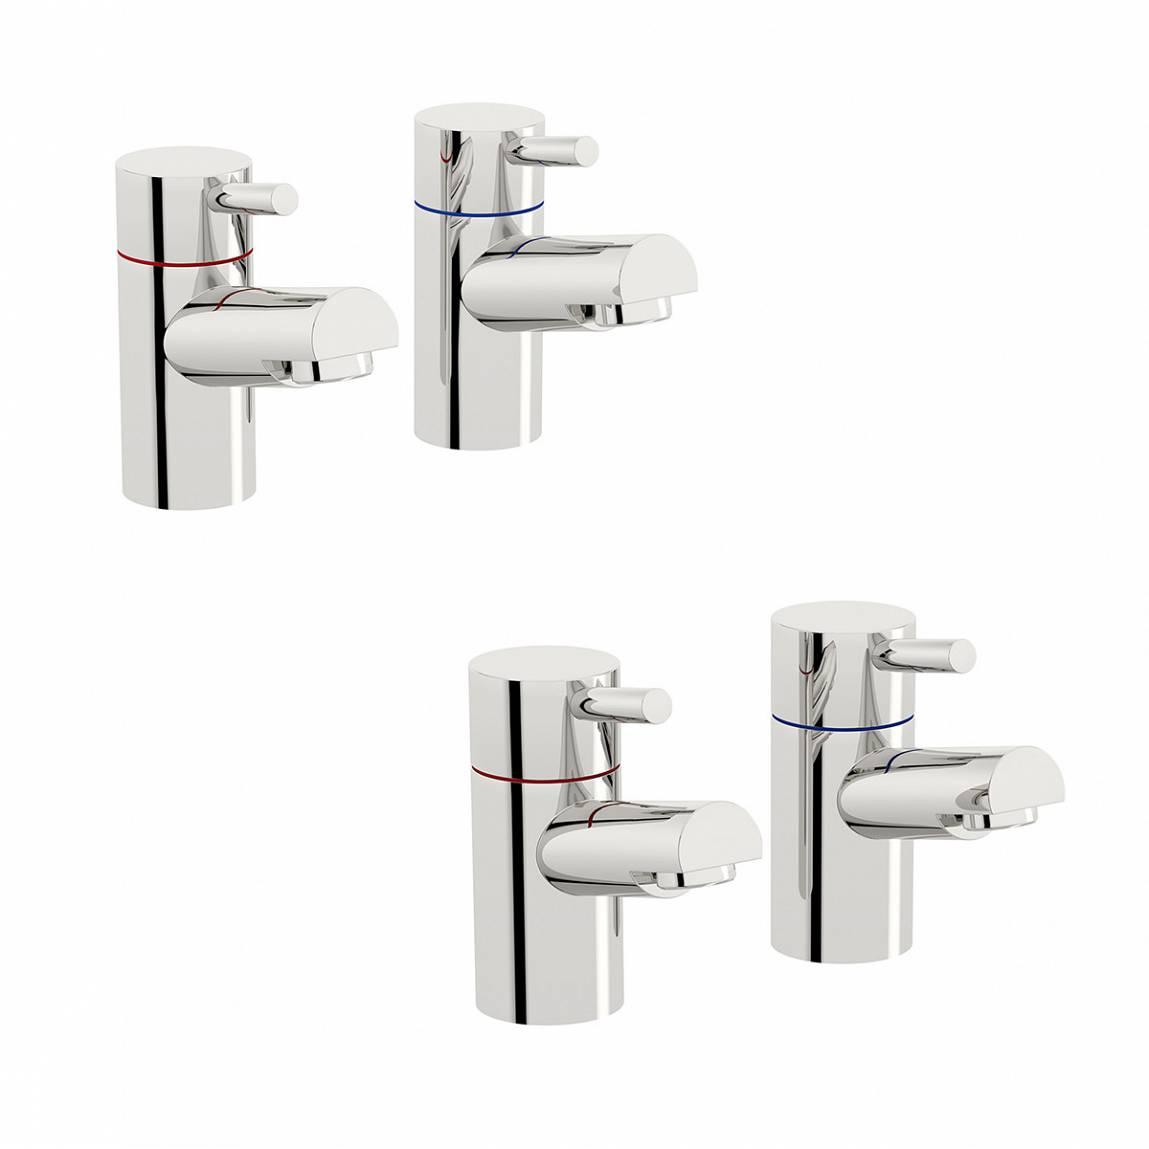 Image of Matrix Basin and Bath Tap Pack